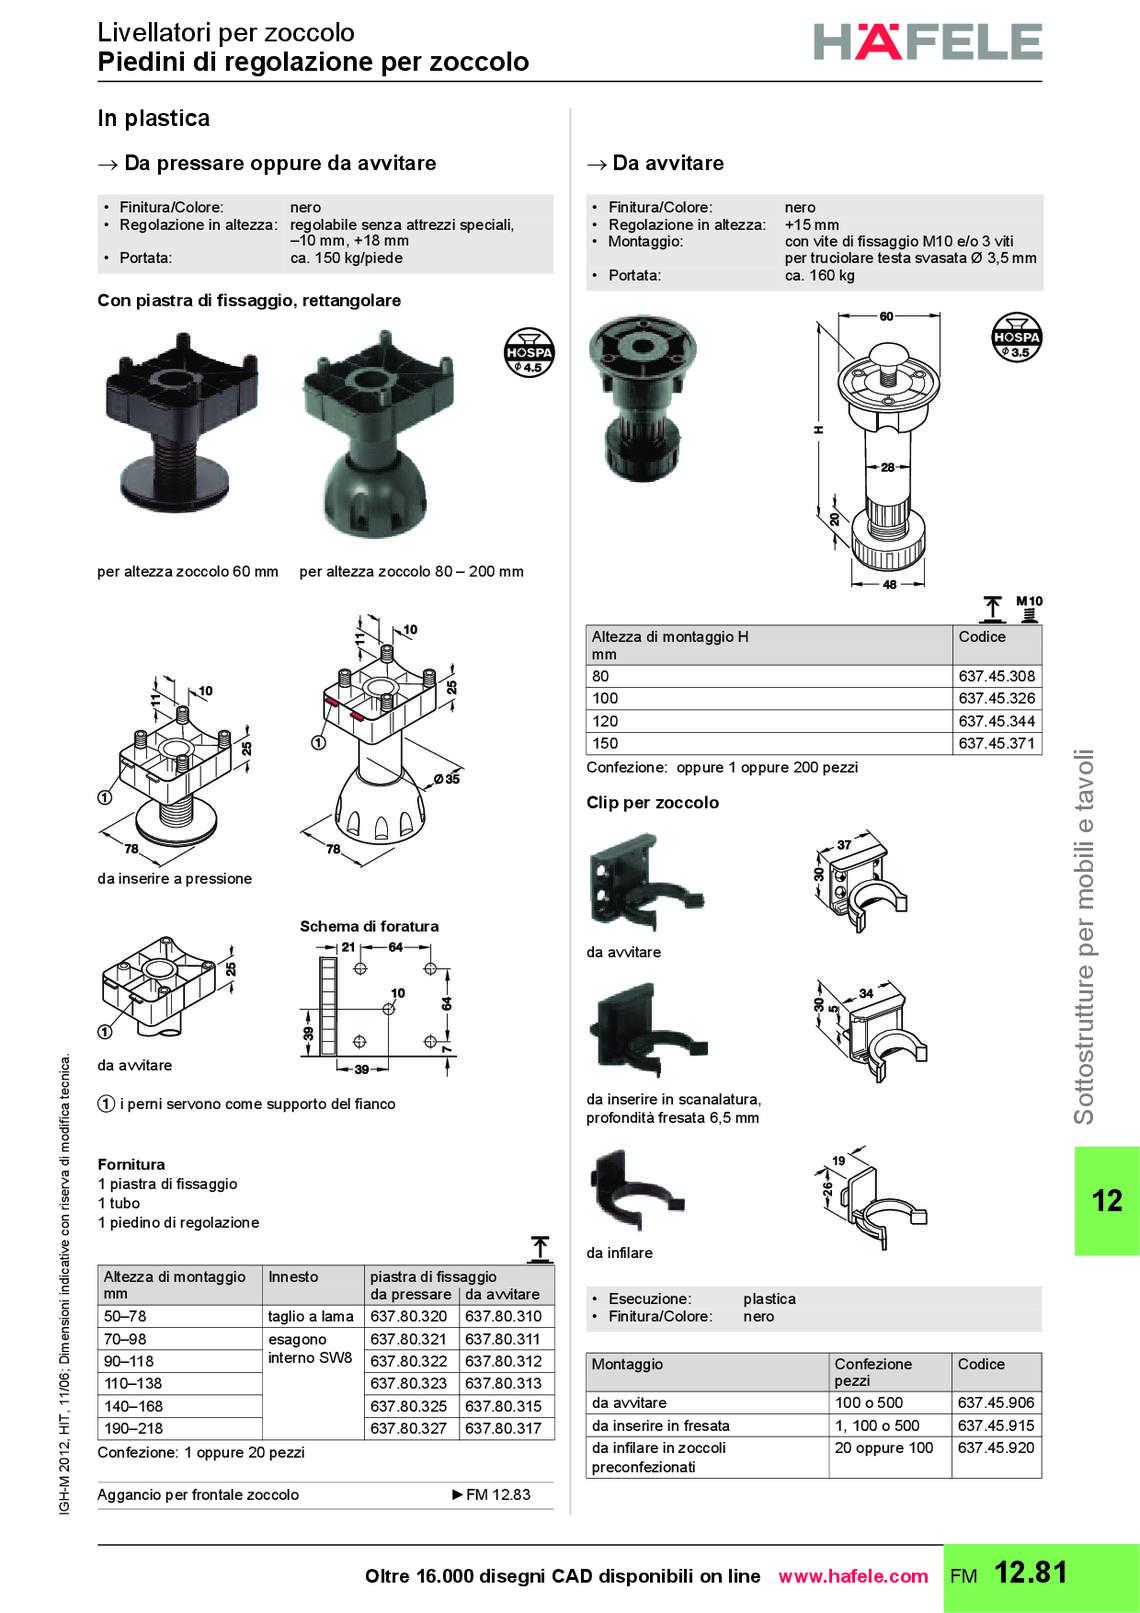 hafele-sottostrutture-per-mobili_83_106.jpg